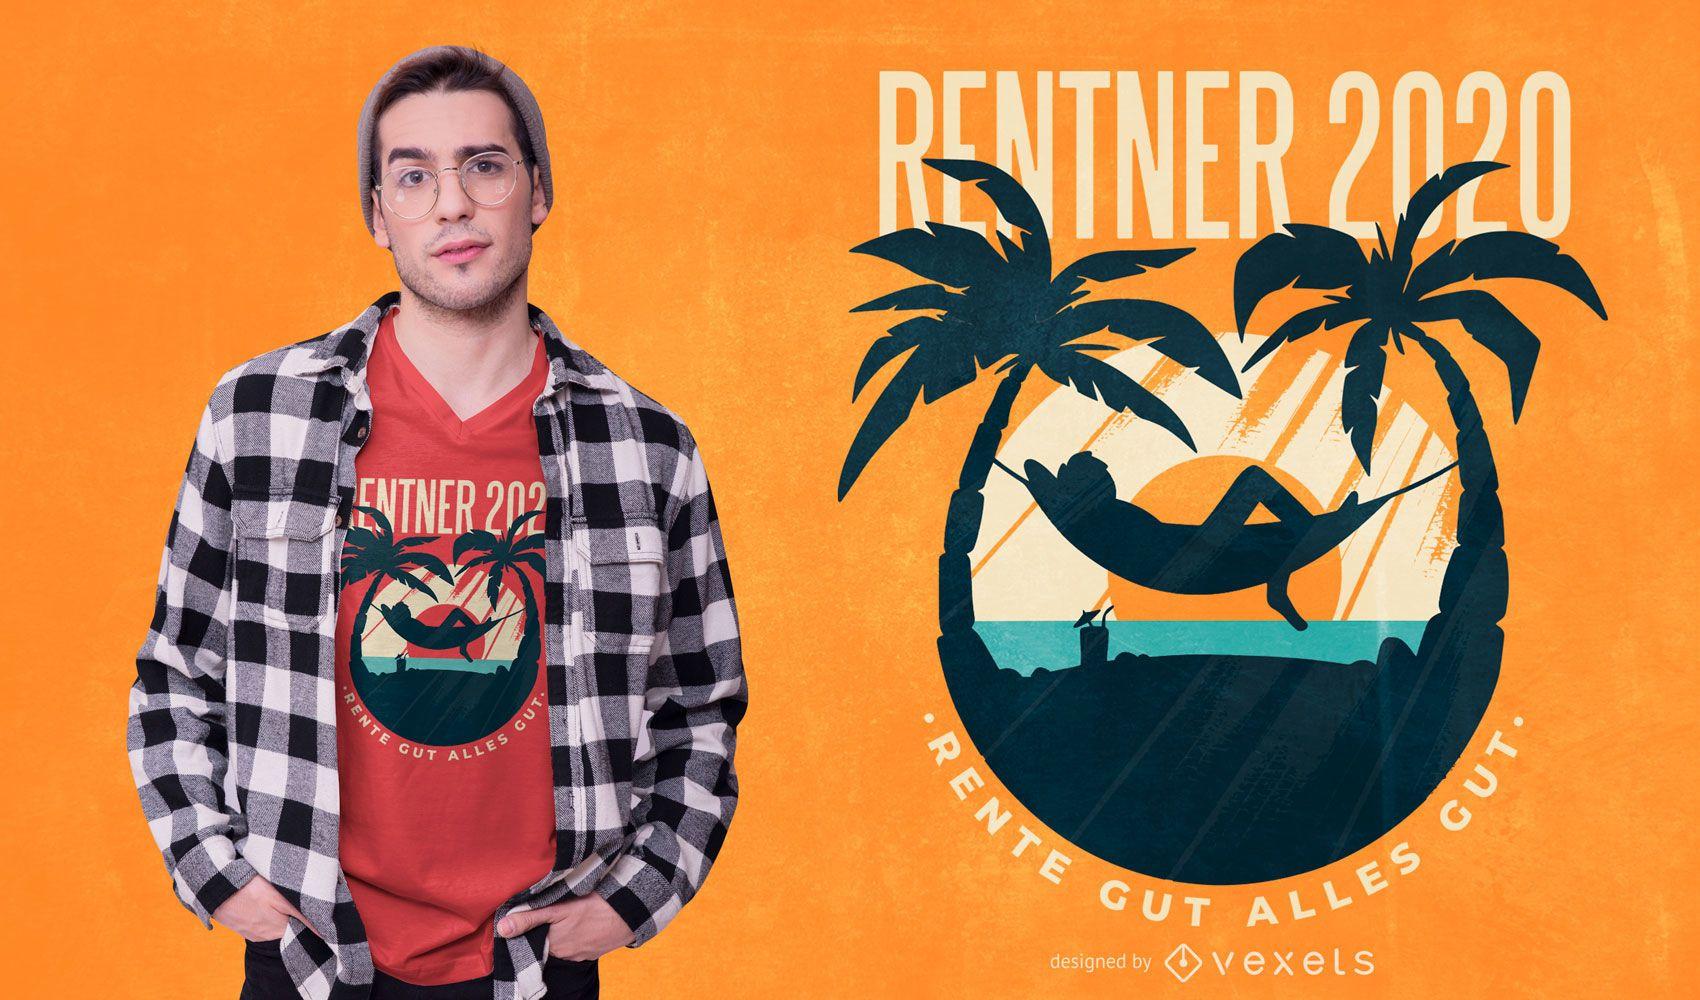 Rentner Deutsch Zitat T-Shirt Design